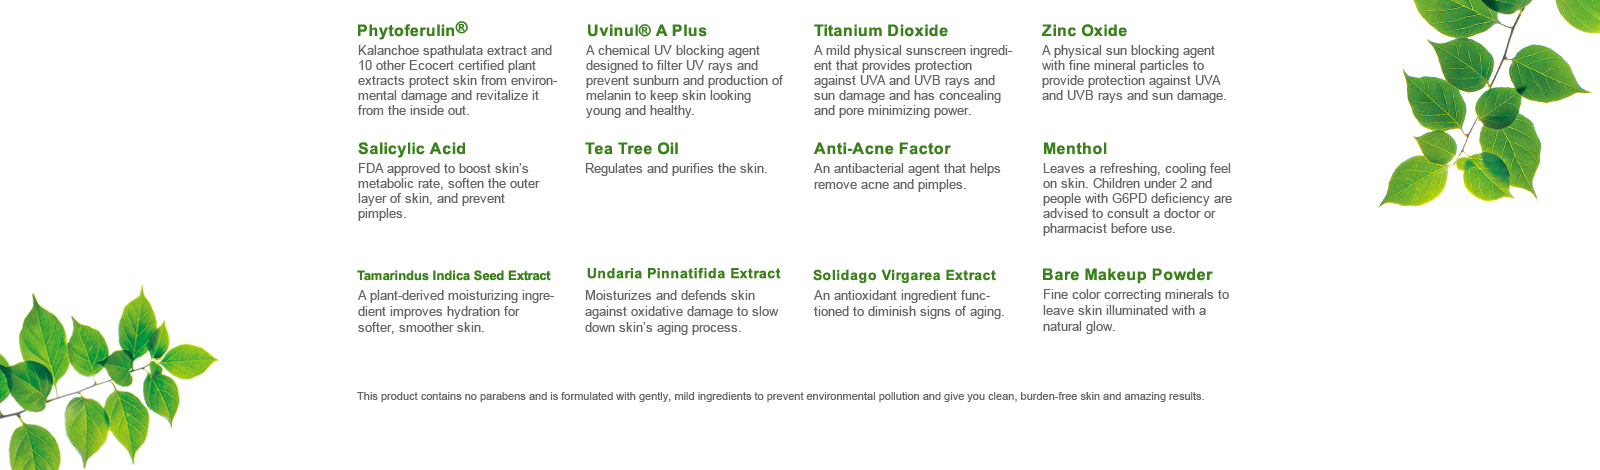 [cml_media_alt id='7047']tea-tree-anti-acne-sunscreen-spf50%c2%b9%c2%b9%c2%b9-03[/cml_media_alt]